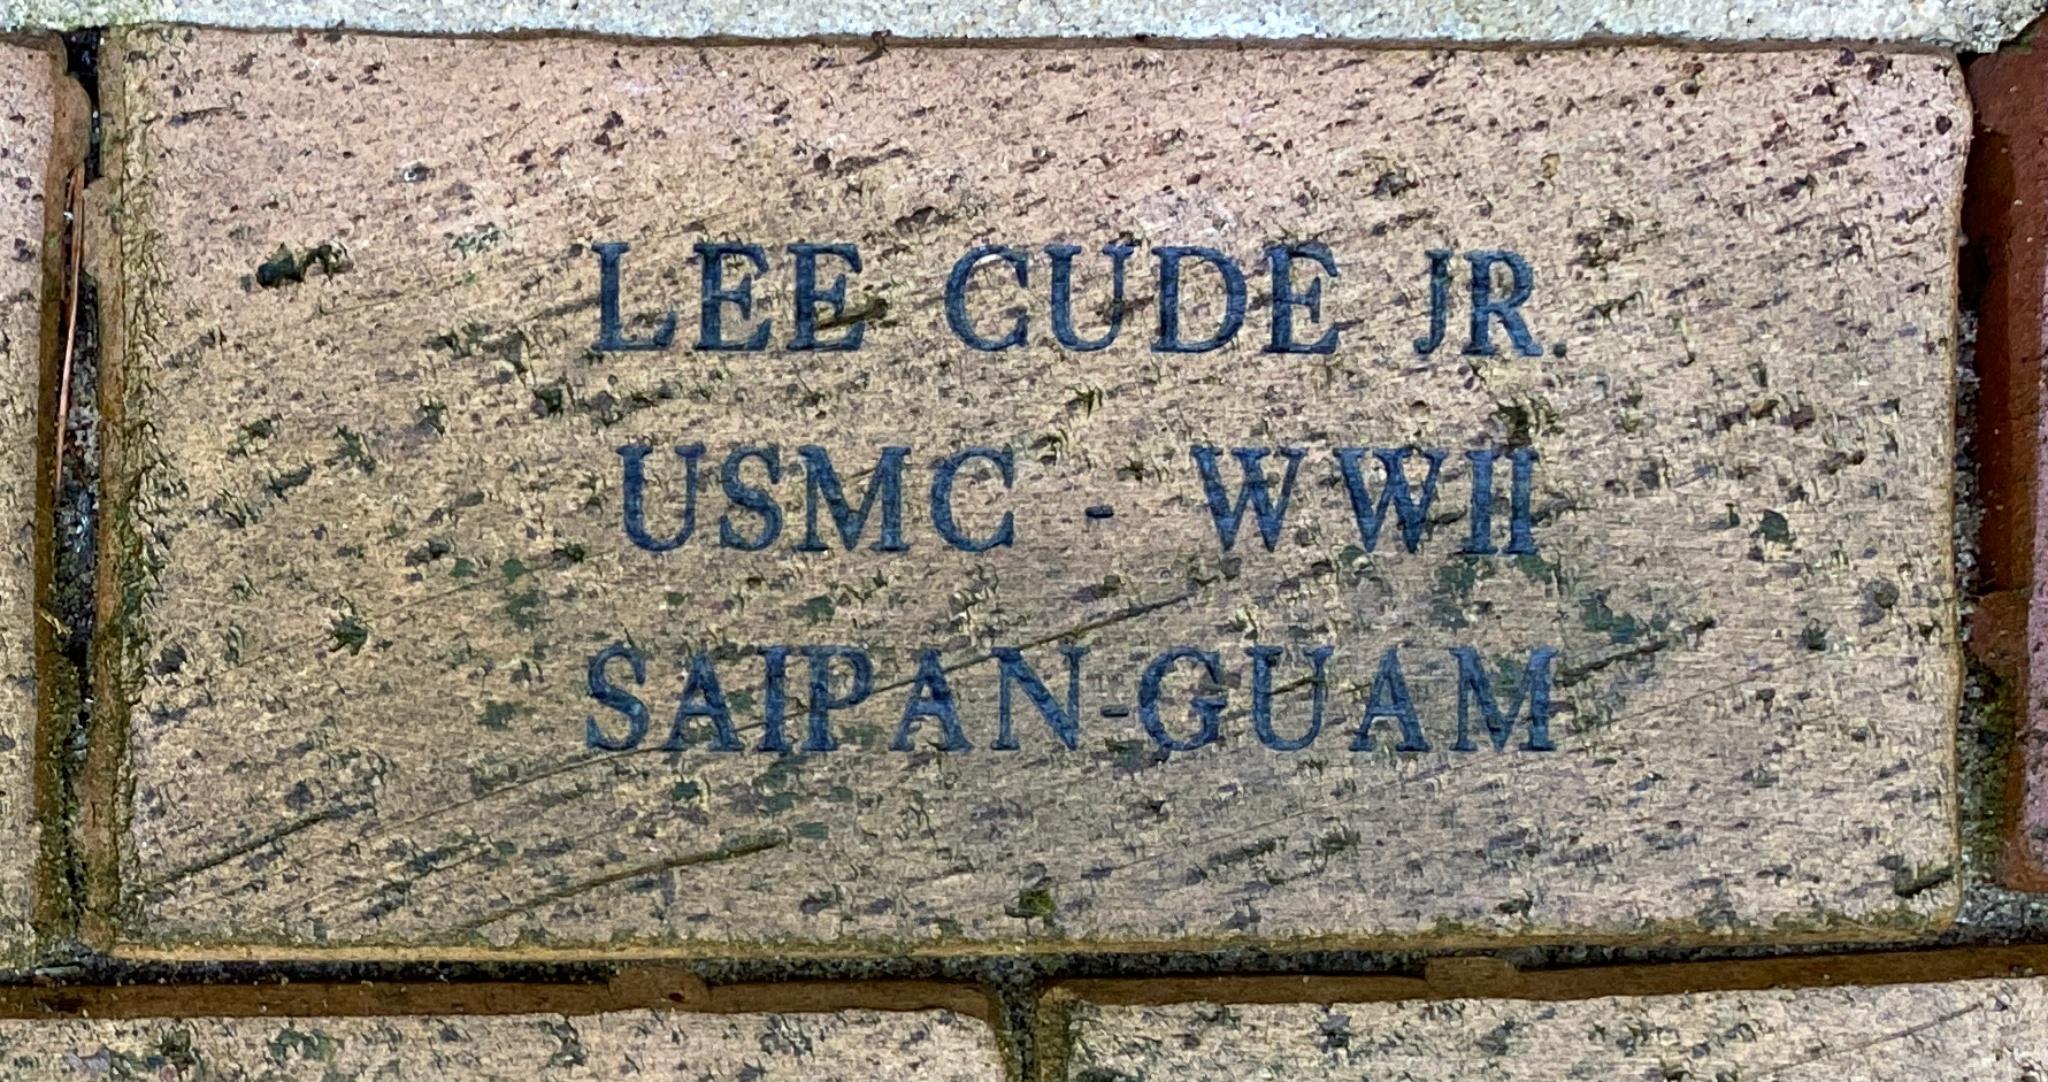 LEE CUDE JR USMC –- WWII SAIPAN-GUAM